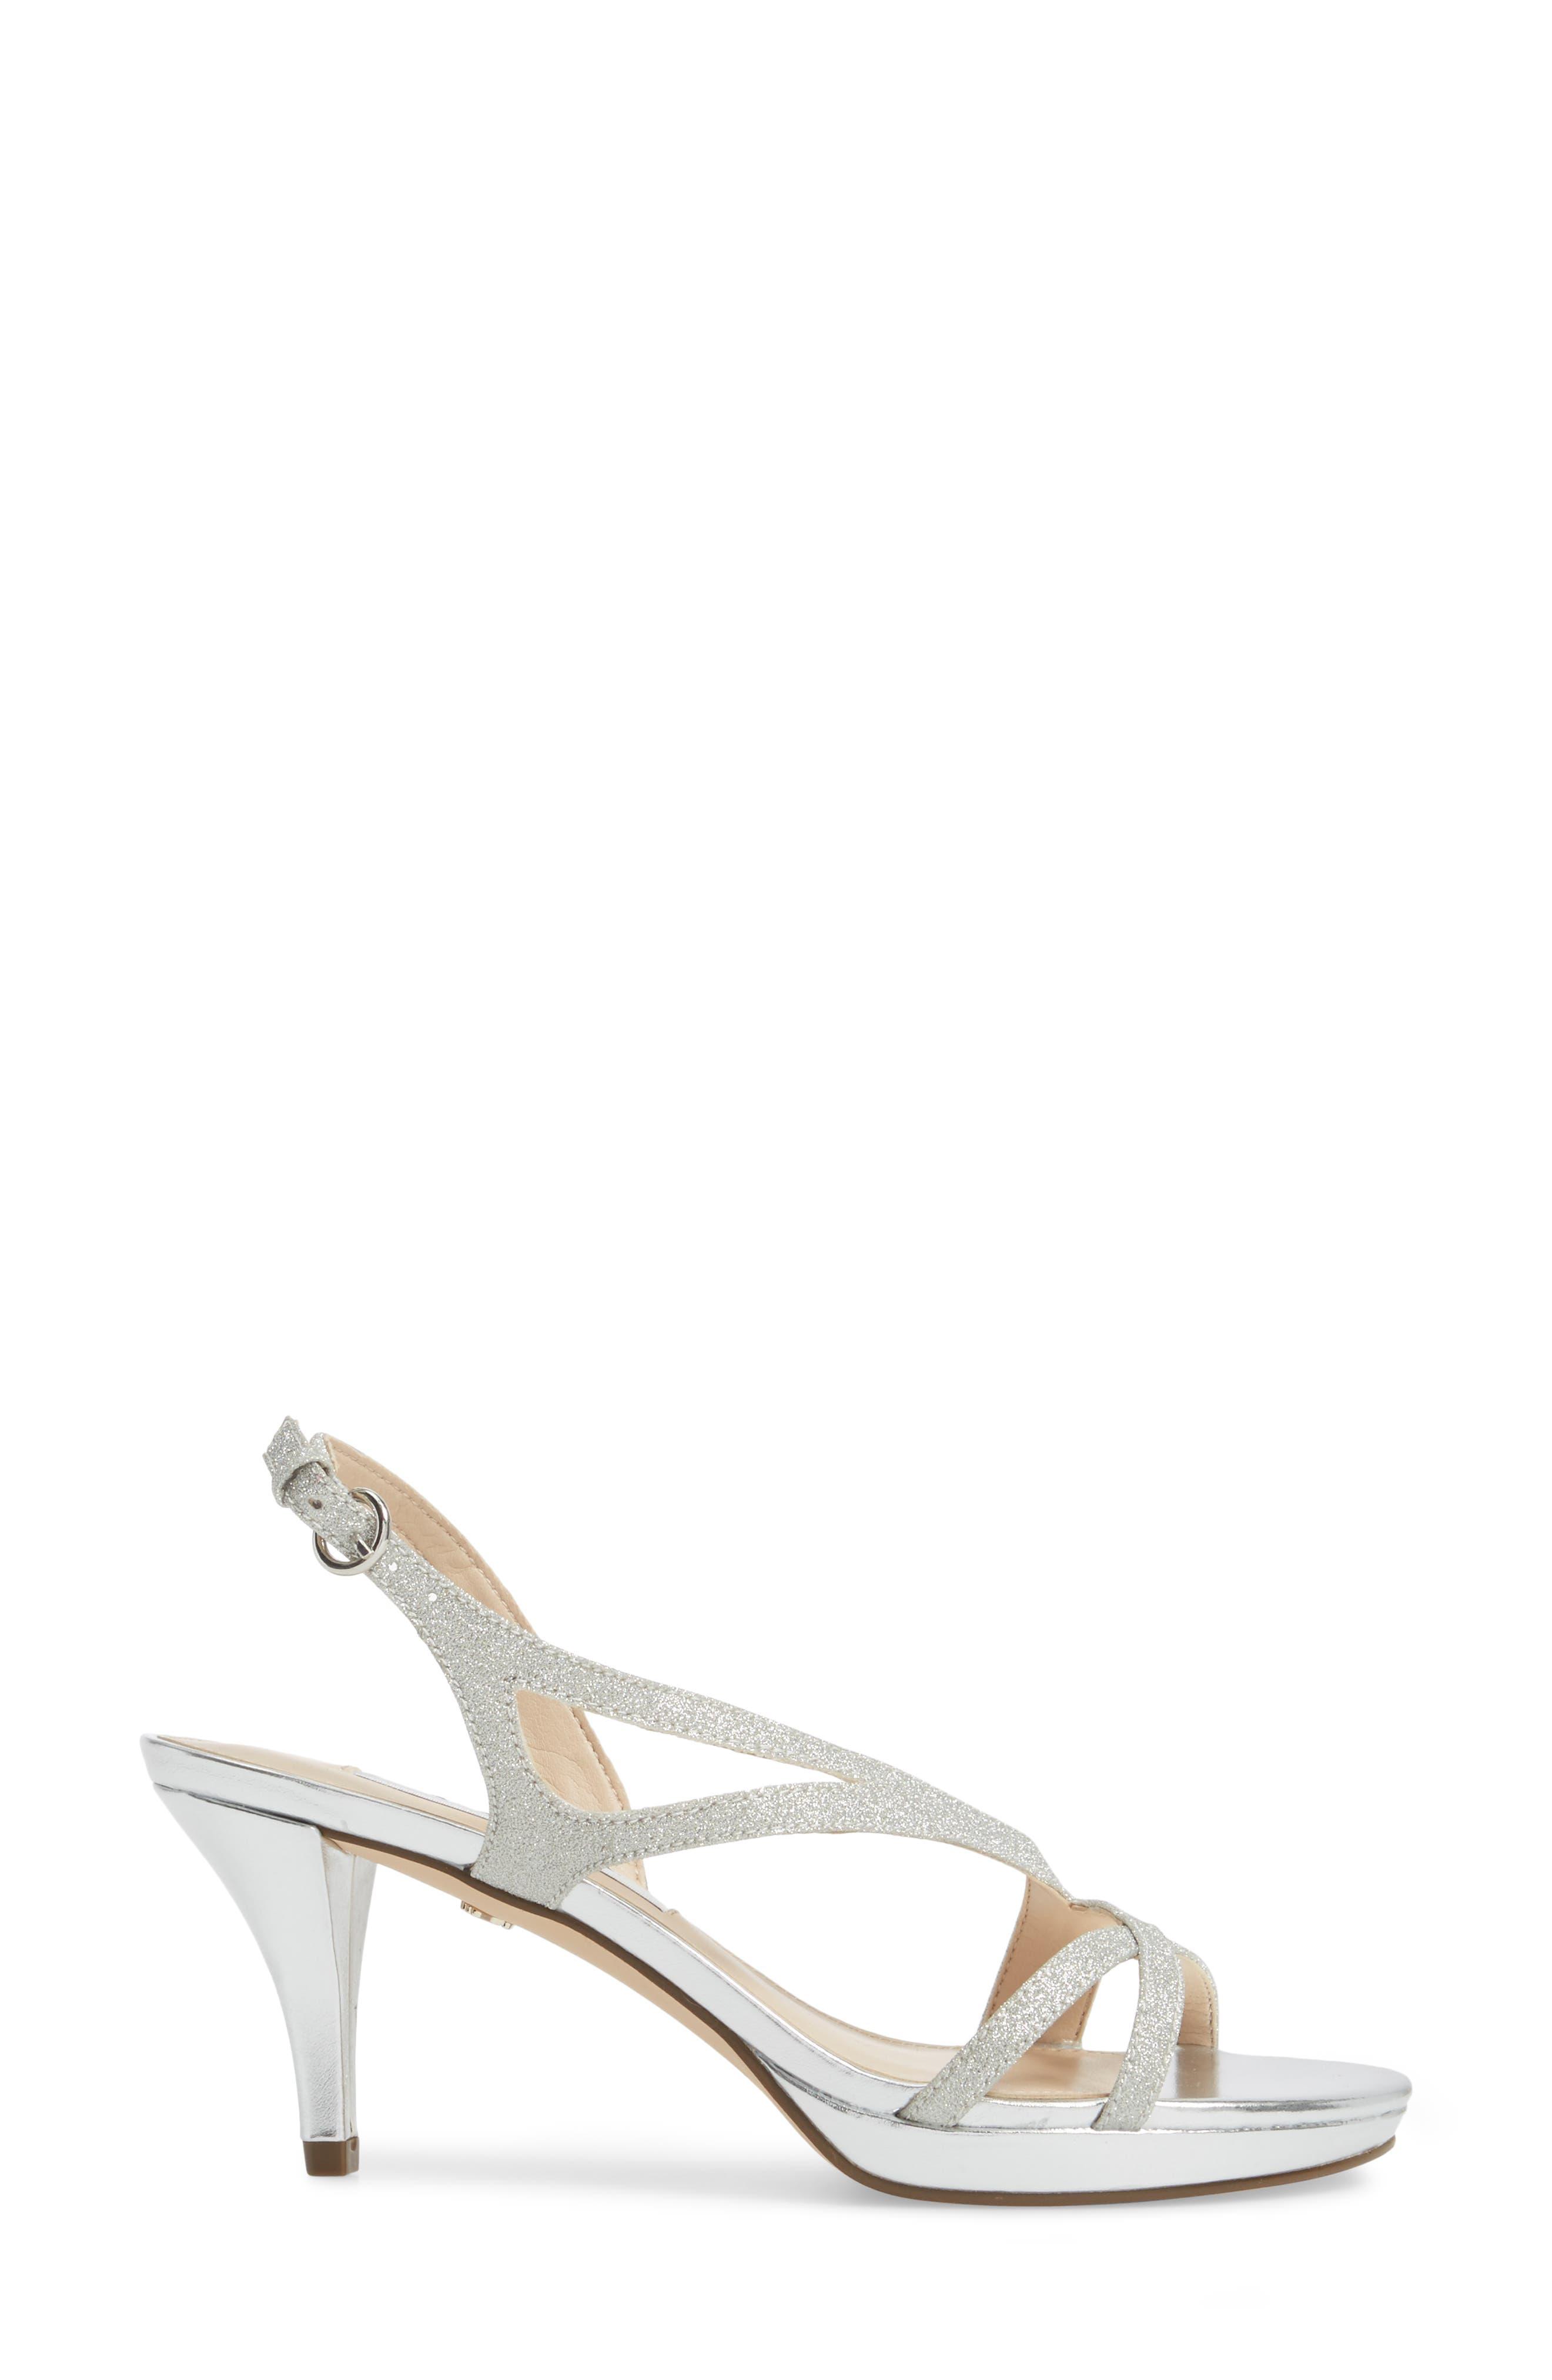 Nura Sandal,                             Alternate thumbnail 3, color,                             Silver Glitter Fabric